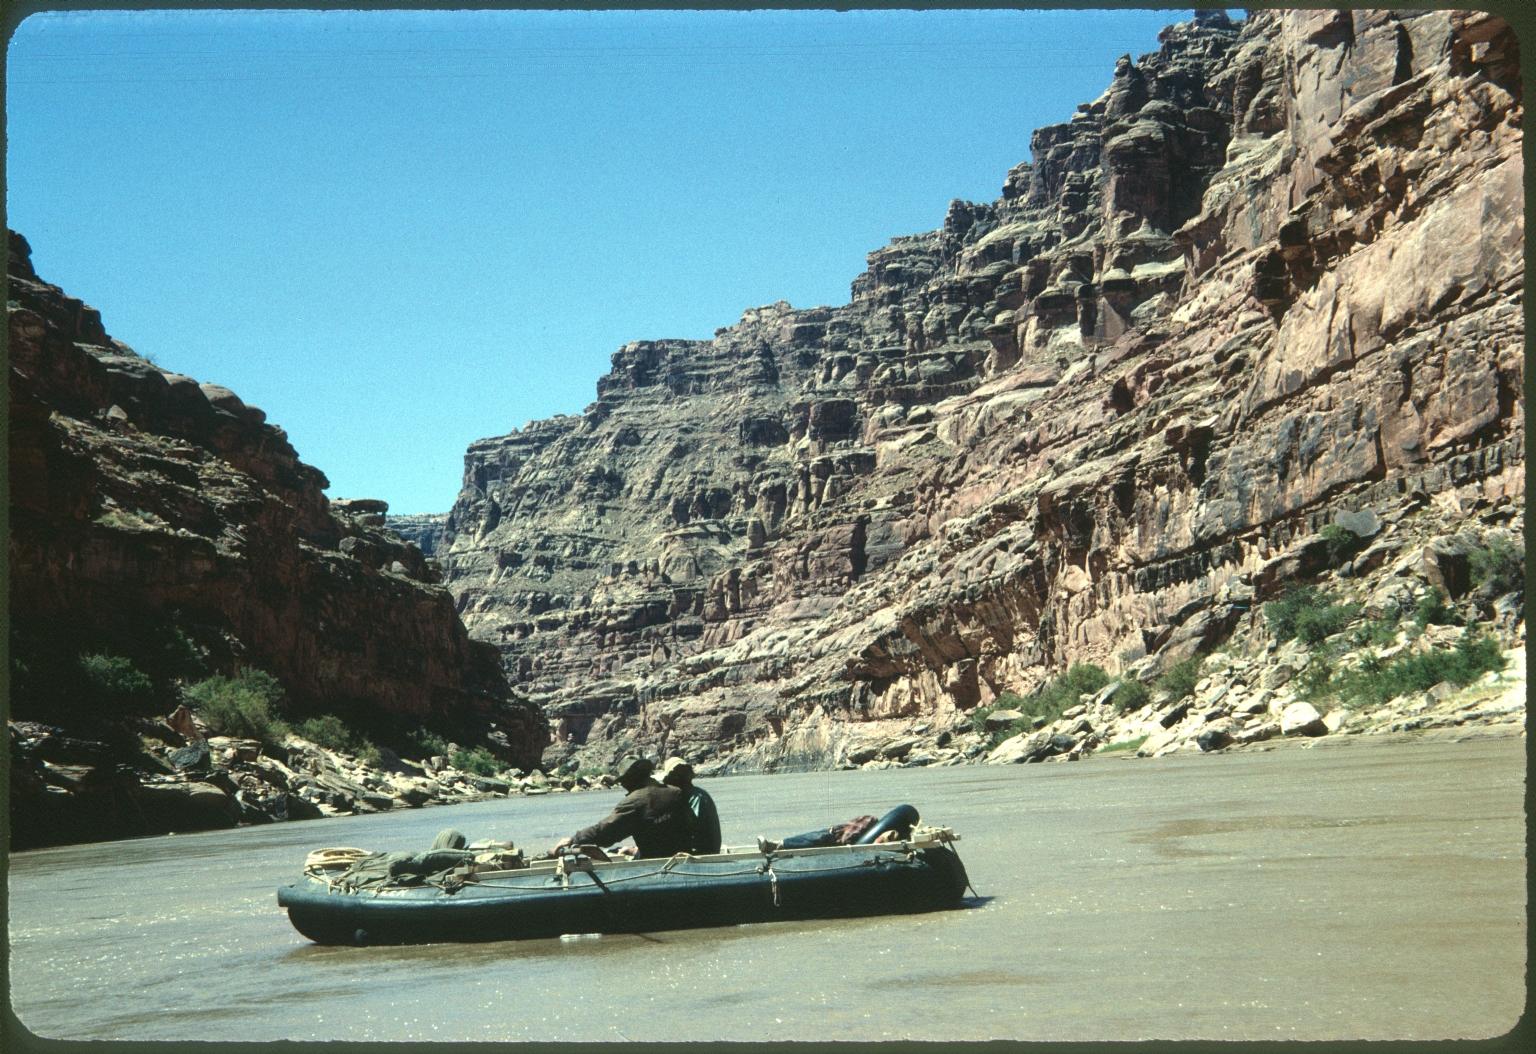 Rafting in Glen Canyon